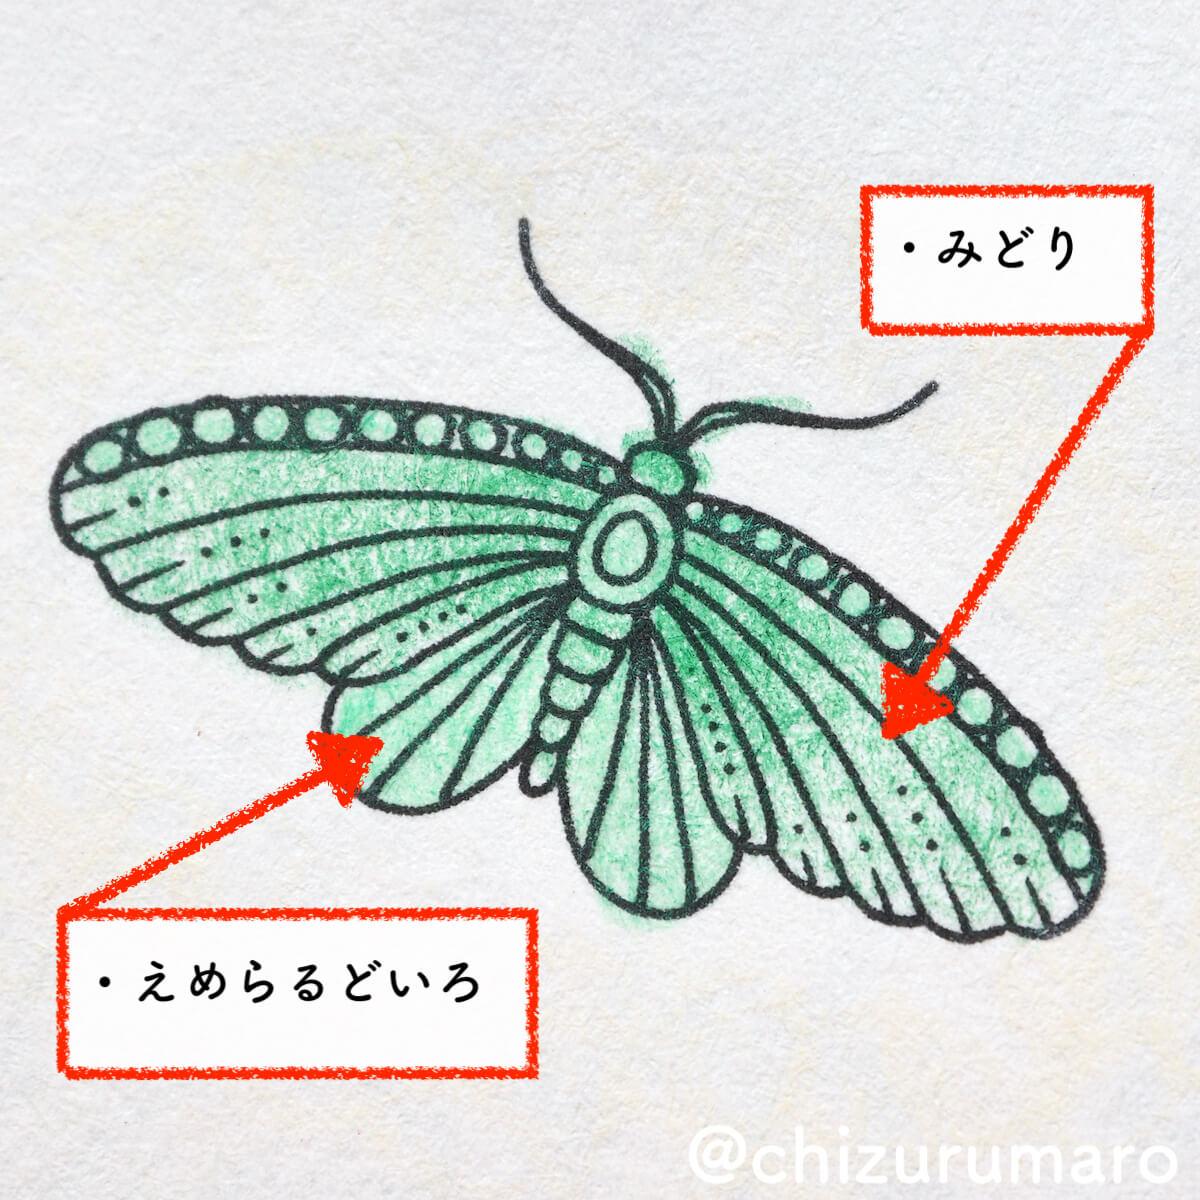 f:id:chizurumaro:20200717220306j:plain